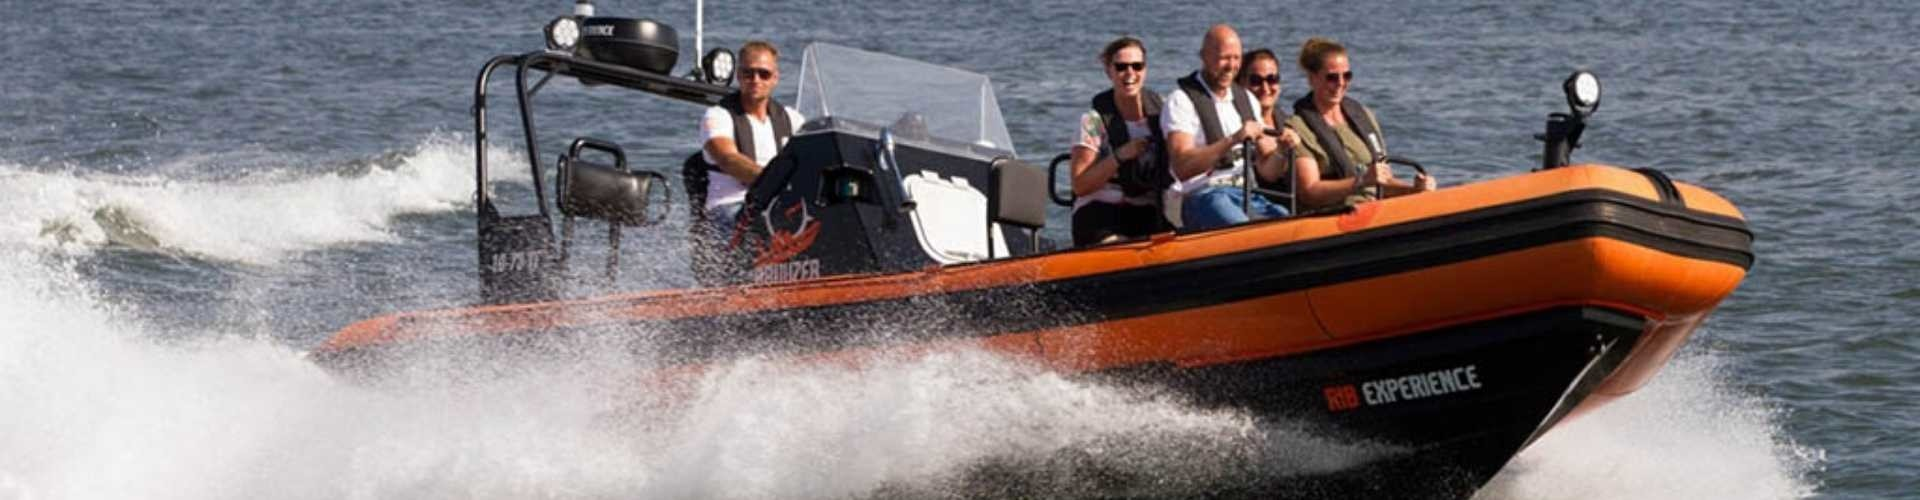 powerboat texel rib experience